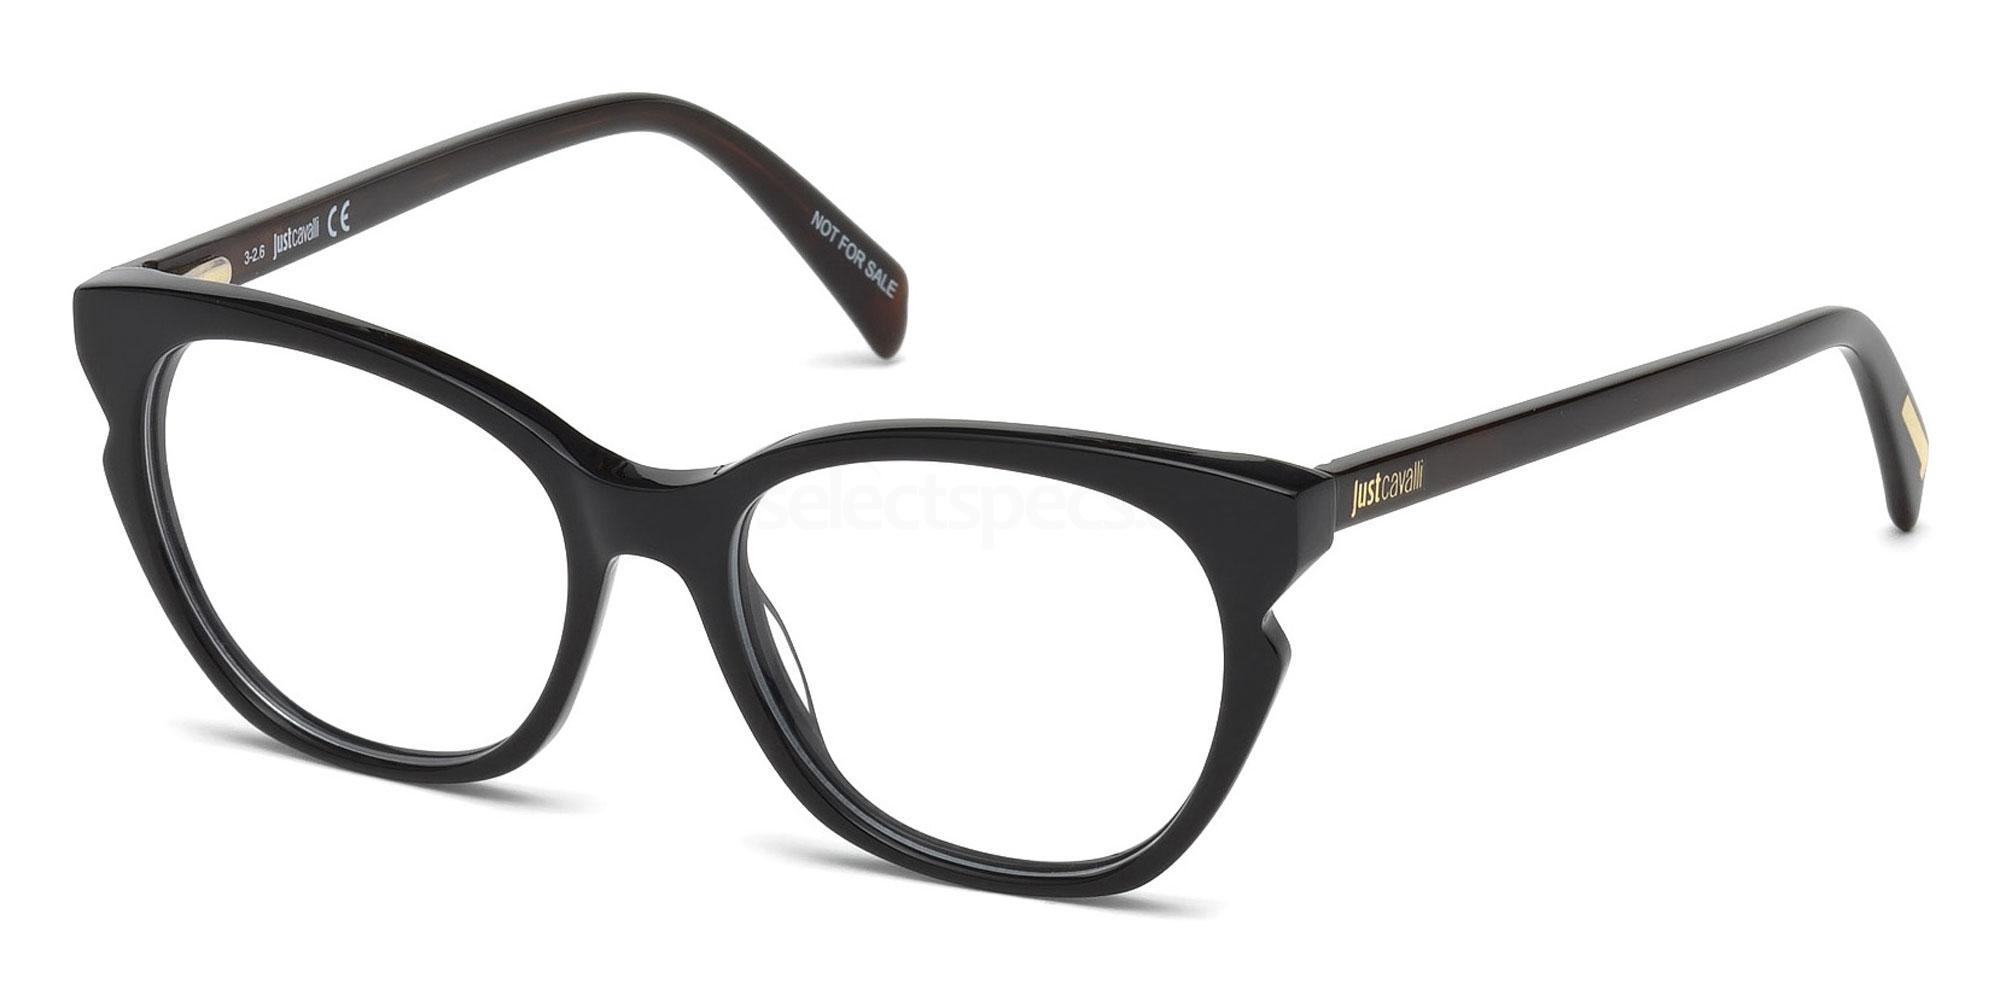 001 JC0798 Glasses, Just Cavalli